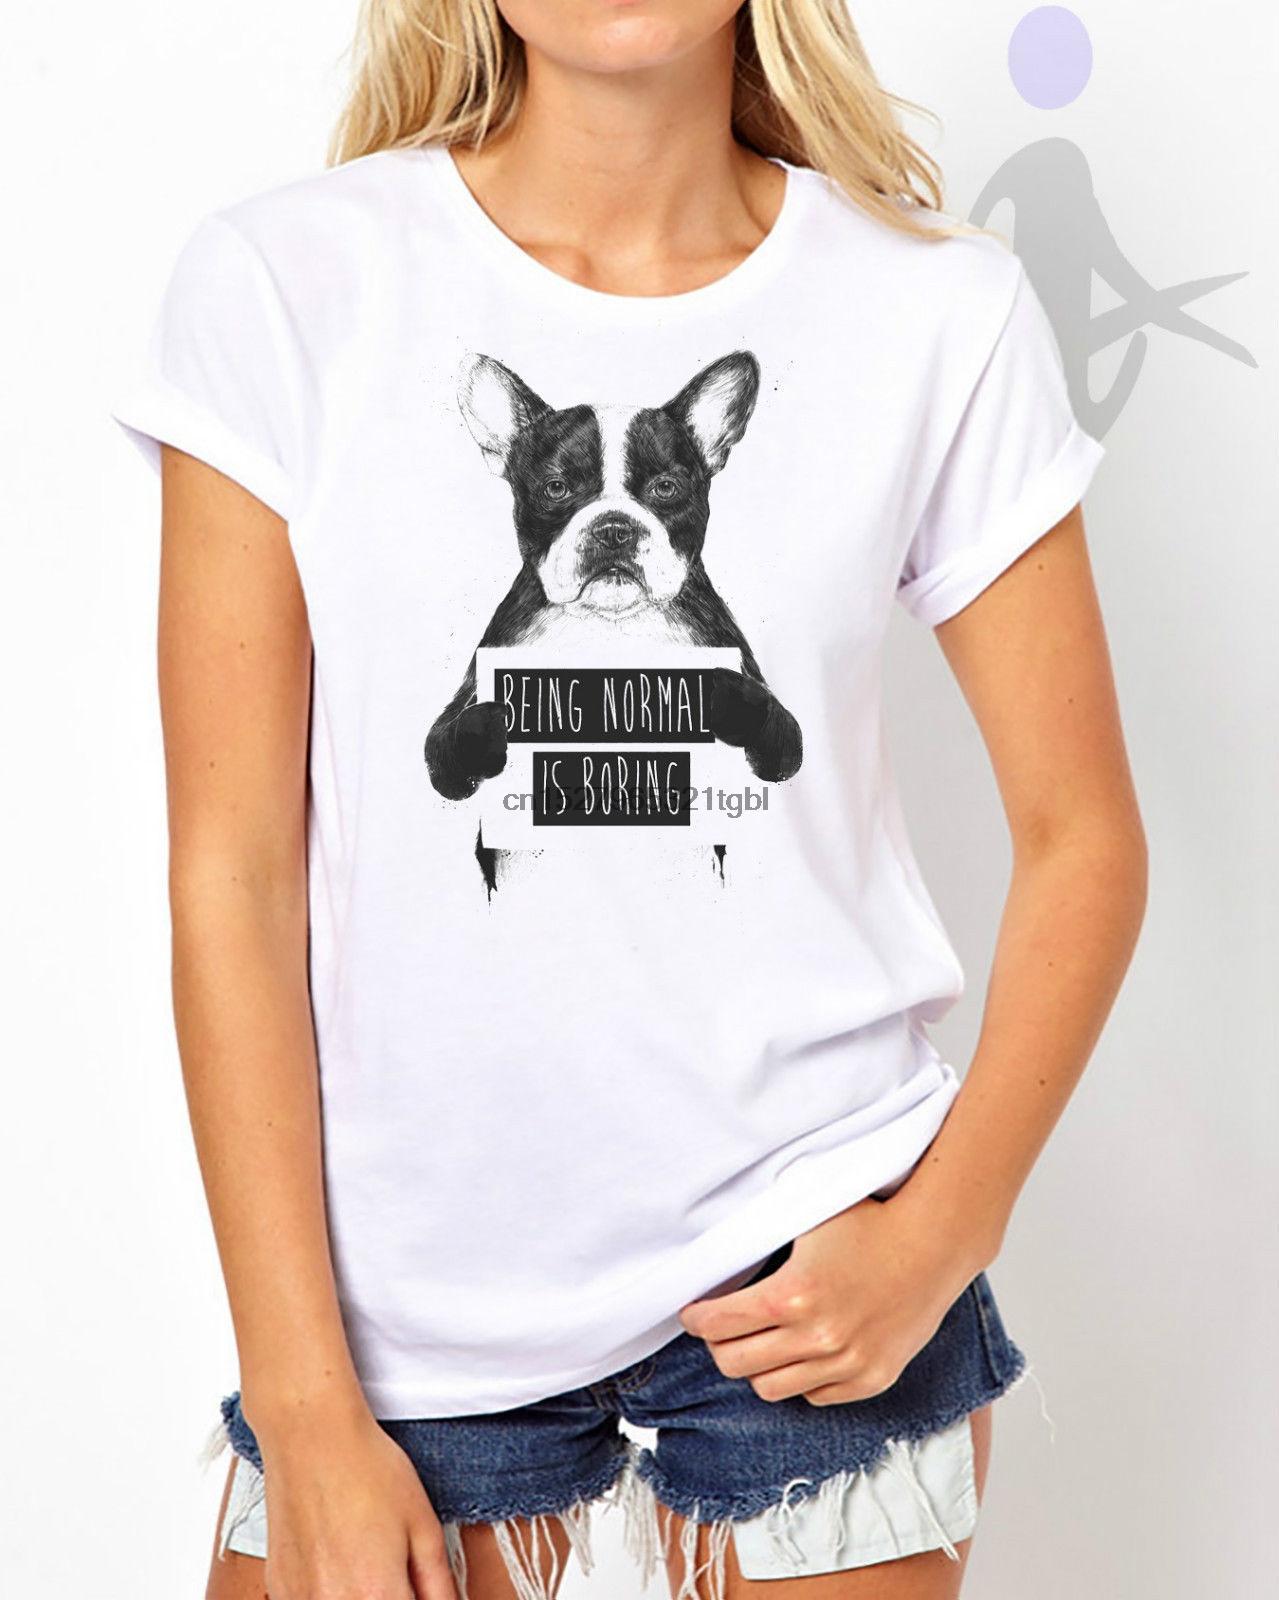 Normal ist Boring Dog Pitbull Humor Lustige Dame-Frauen-T-Shirt Top W23 100% Baumwolle Kurzarm O-Ansatz Oberseiten T Shirts